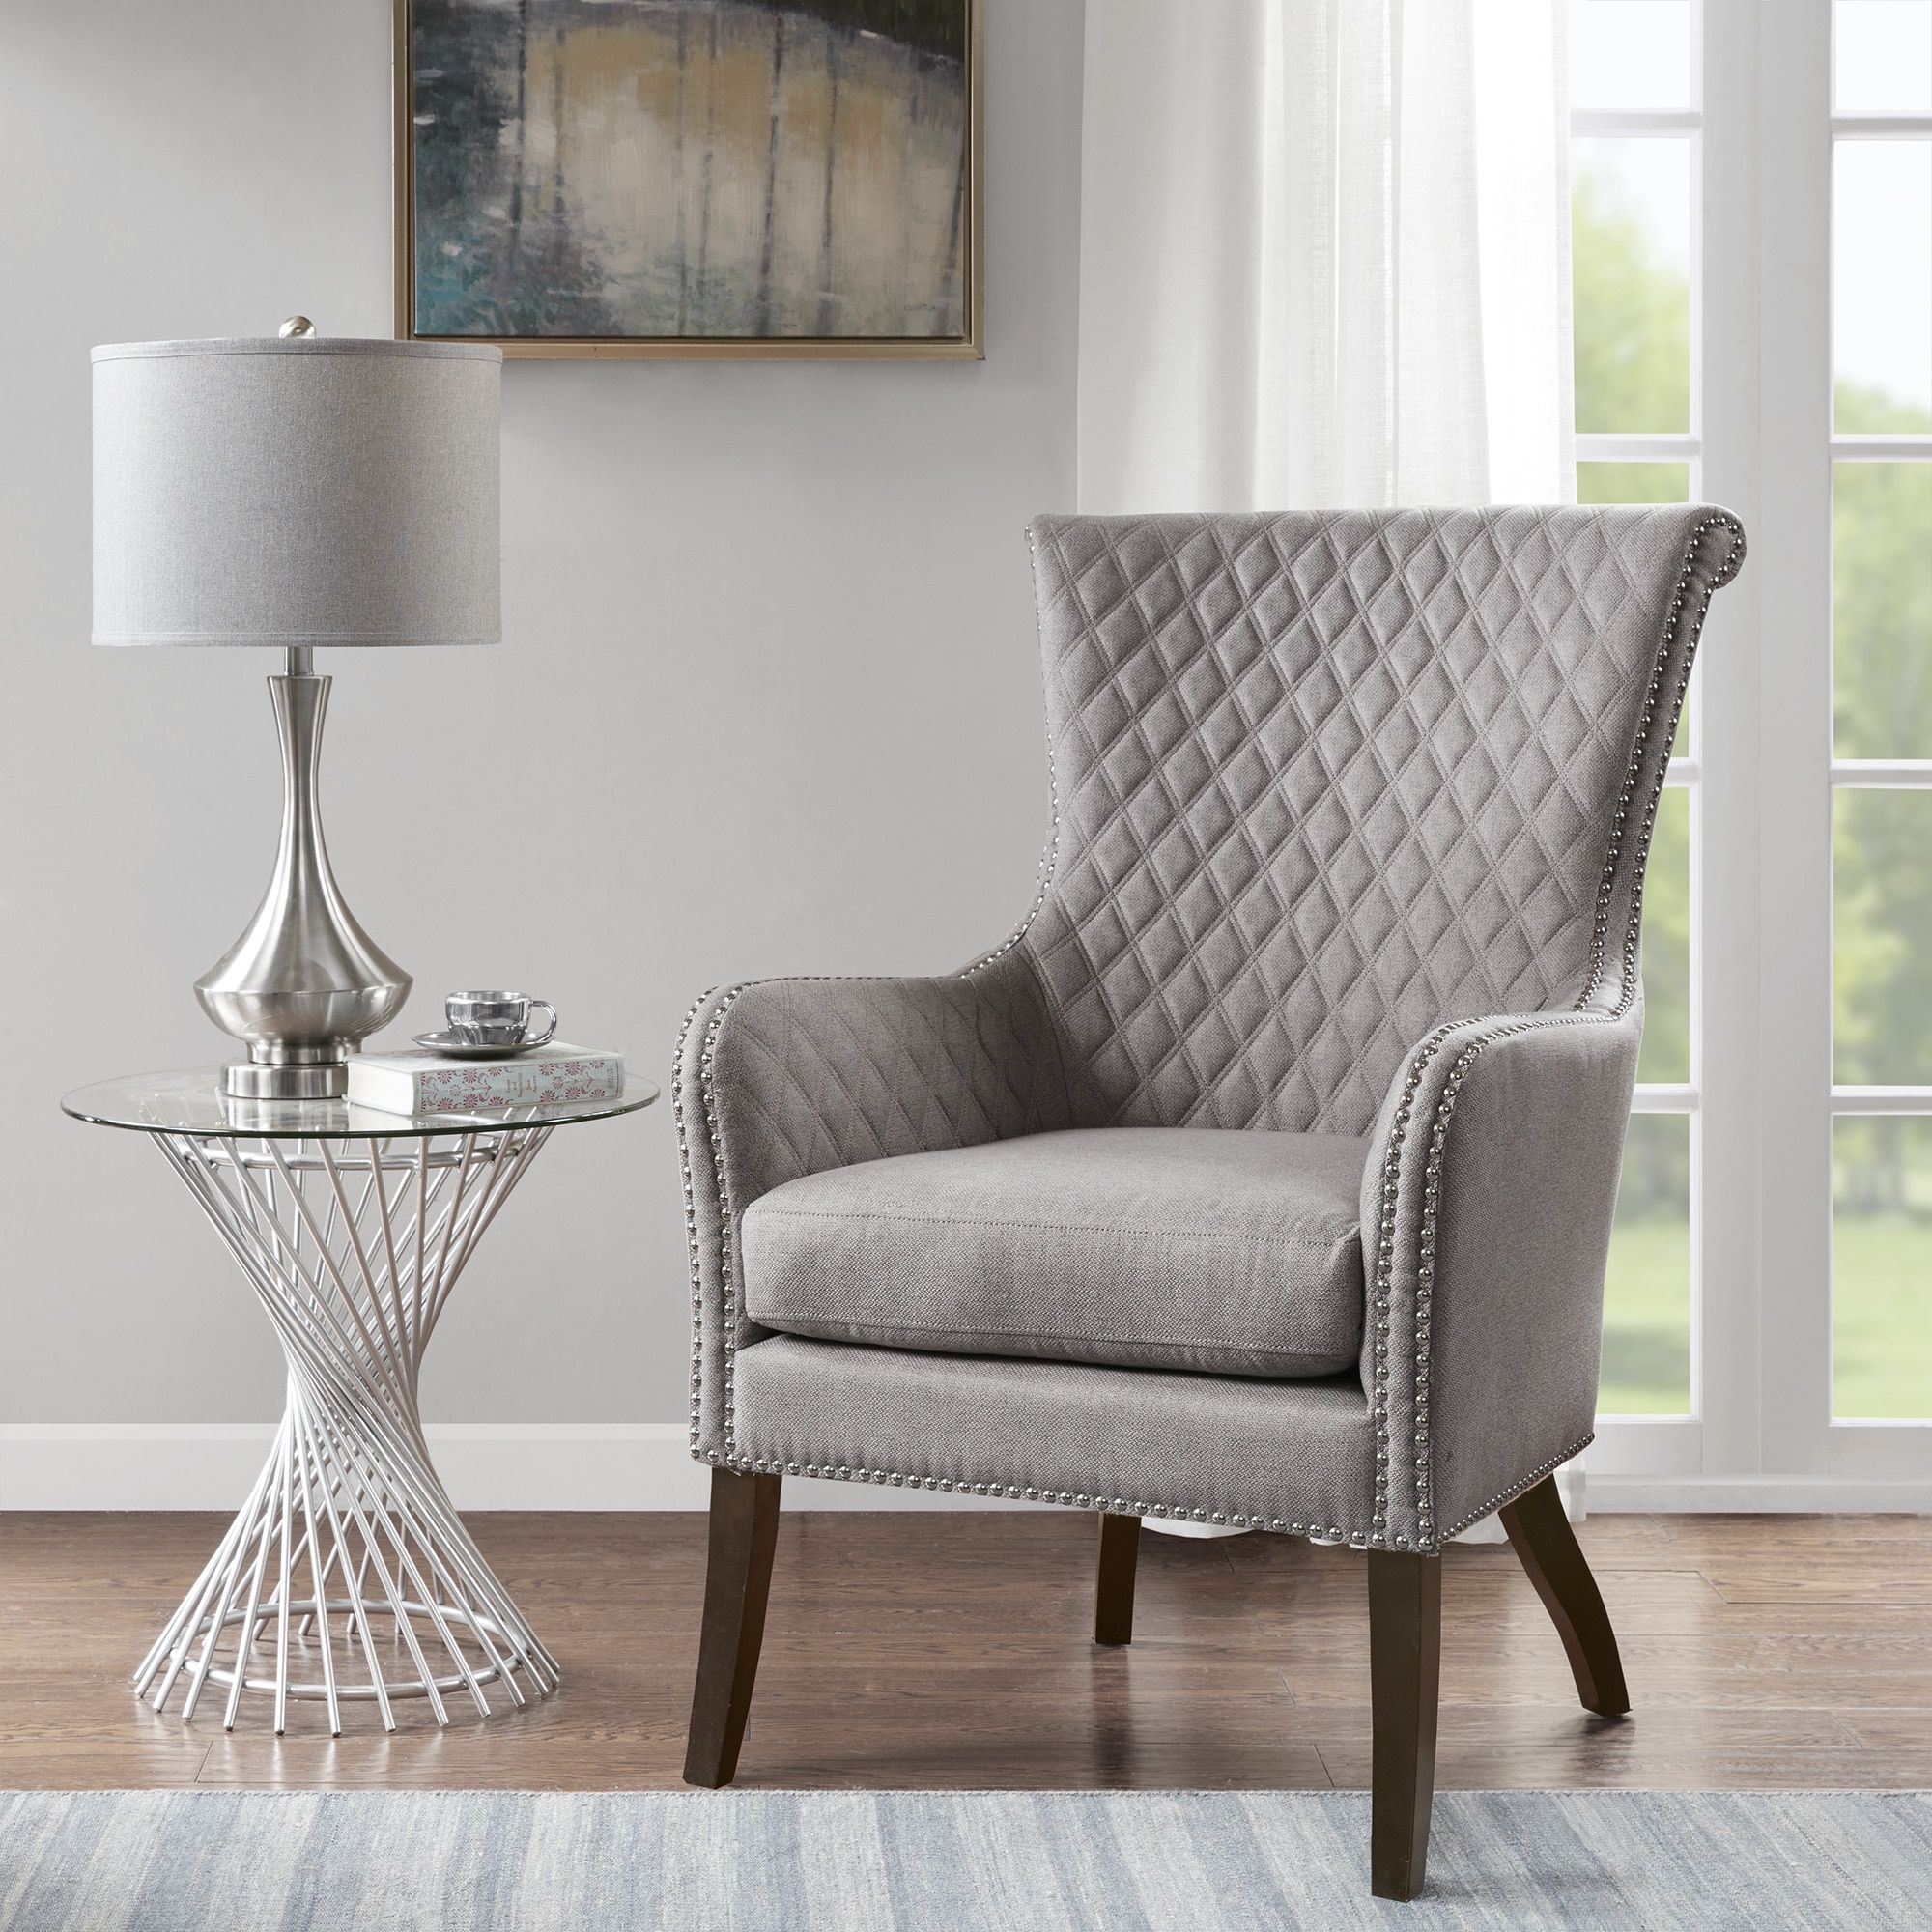 Madison Park Lea Light Grey Accent Chair 27 75w X 32 5 D X 41 33